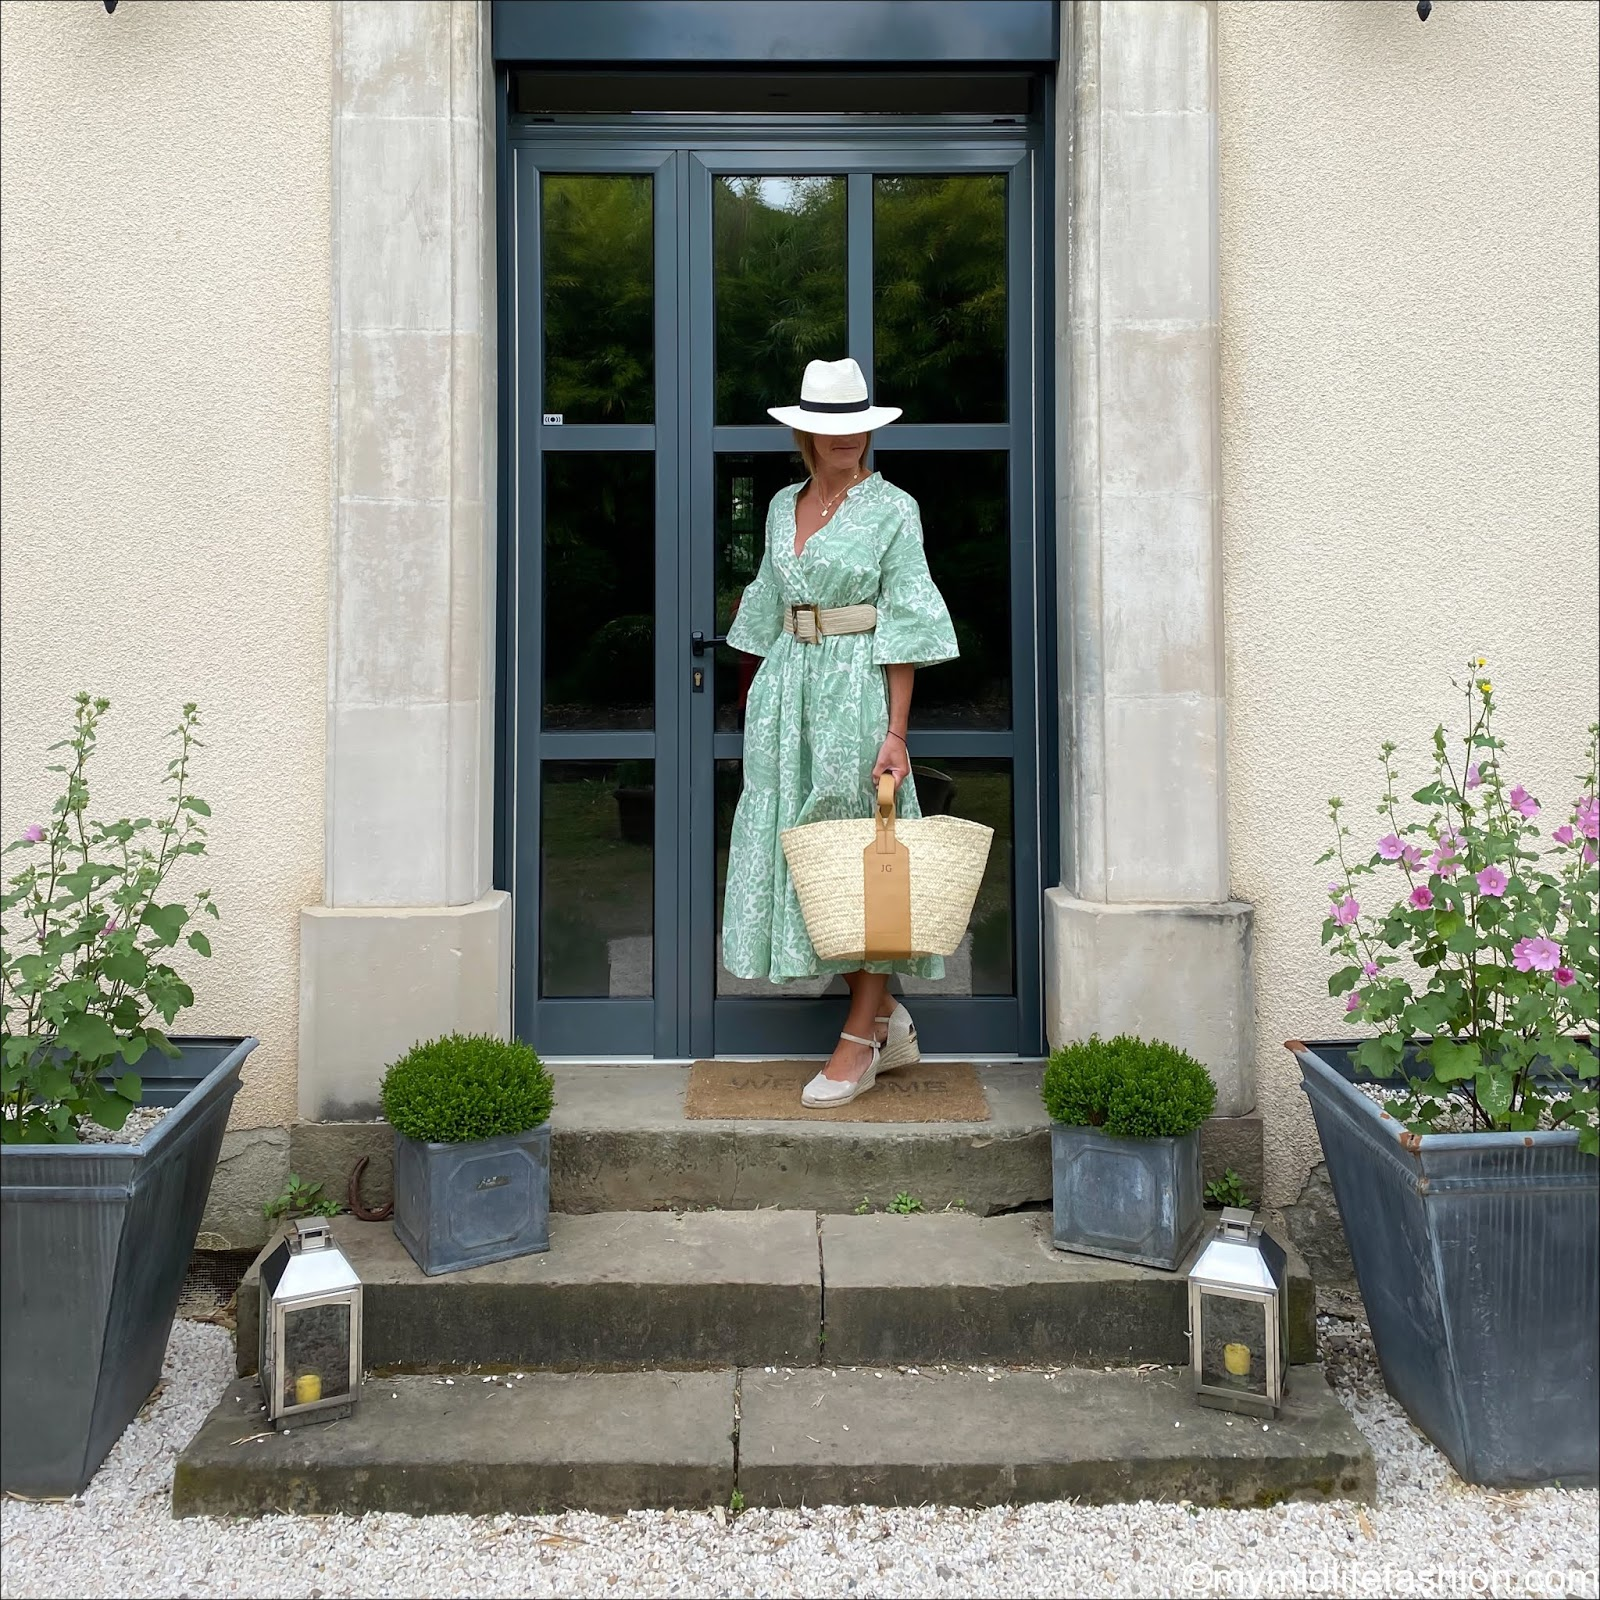 my midlife fashion, Beaumont organic tulsi organic cotton dress, Carl Scarpa Brittany nude sandals, rae feather monogram grace basket, zara Panama hat, zara jute belt